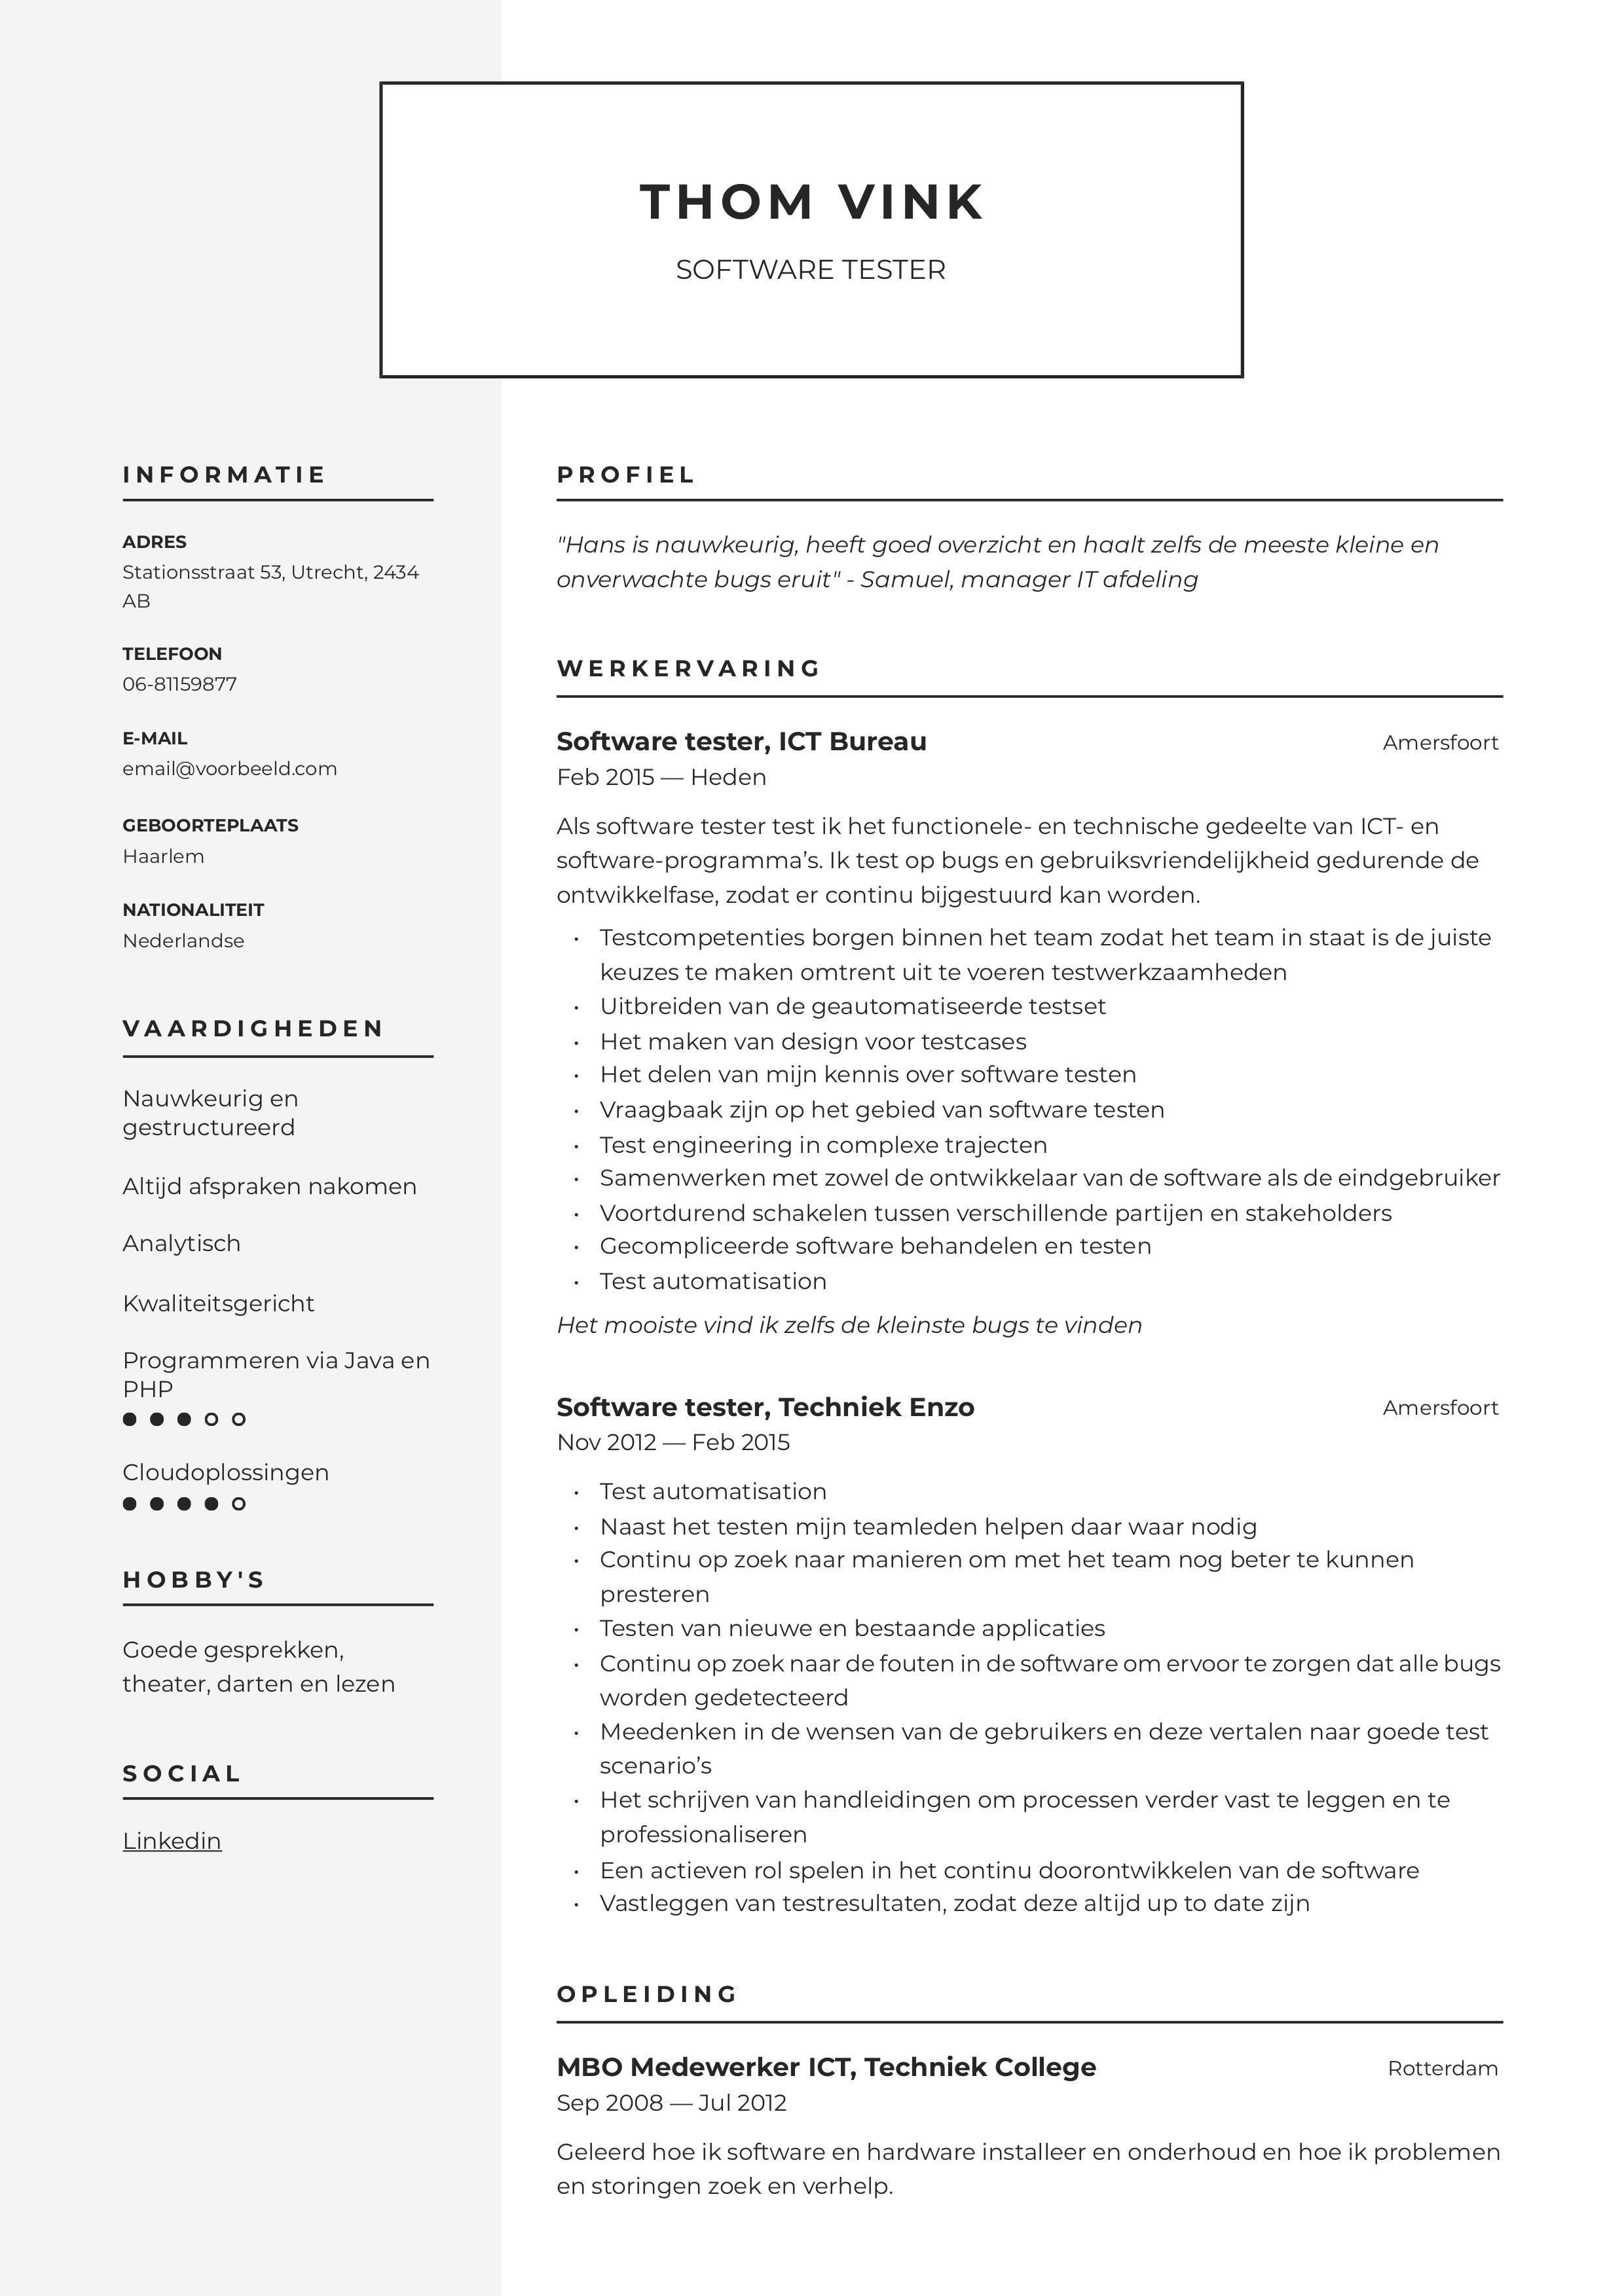 CV Software tester